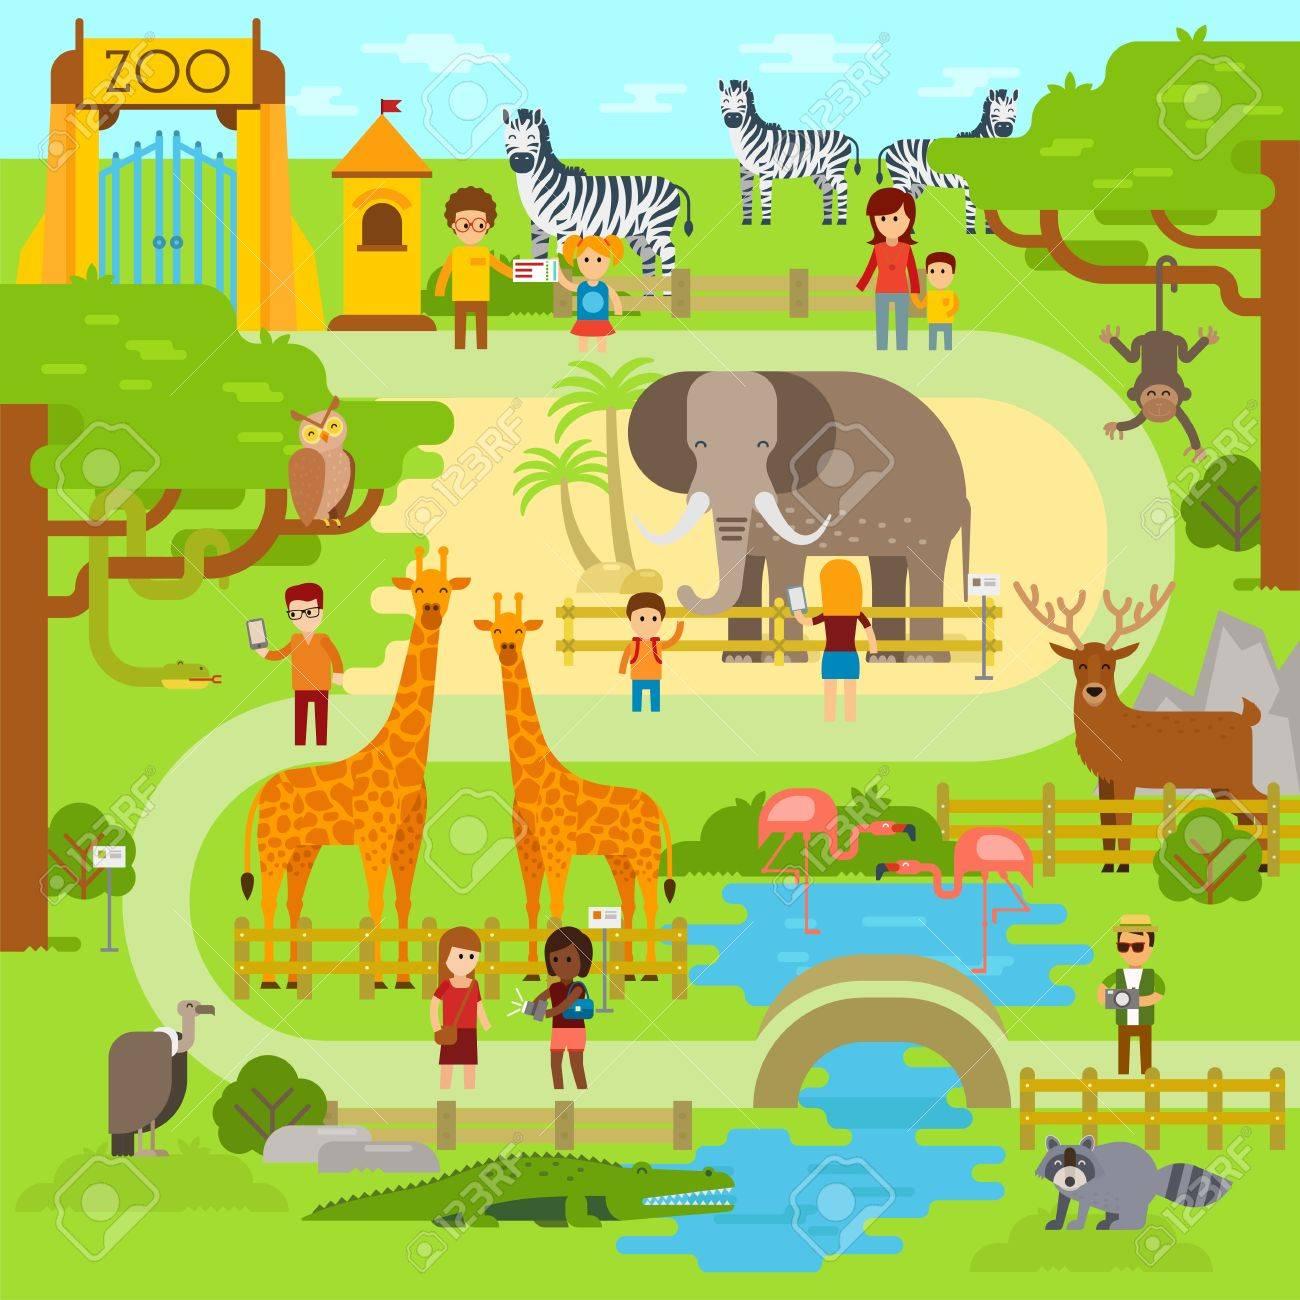 Zoo Clipart zoologico 2.